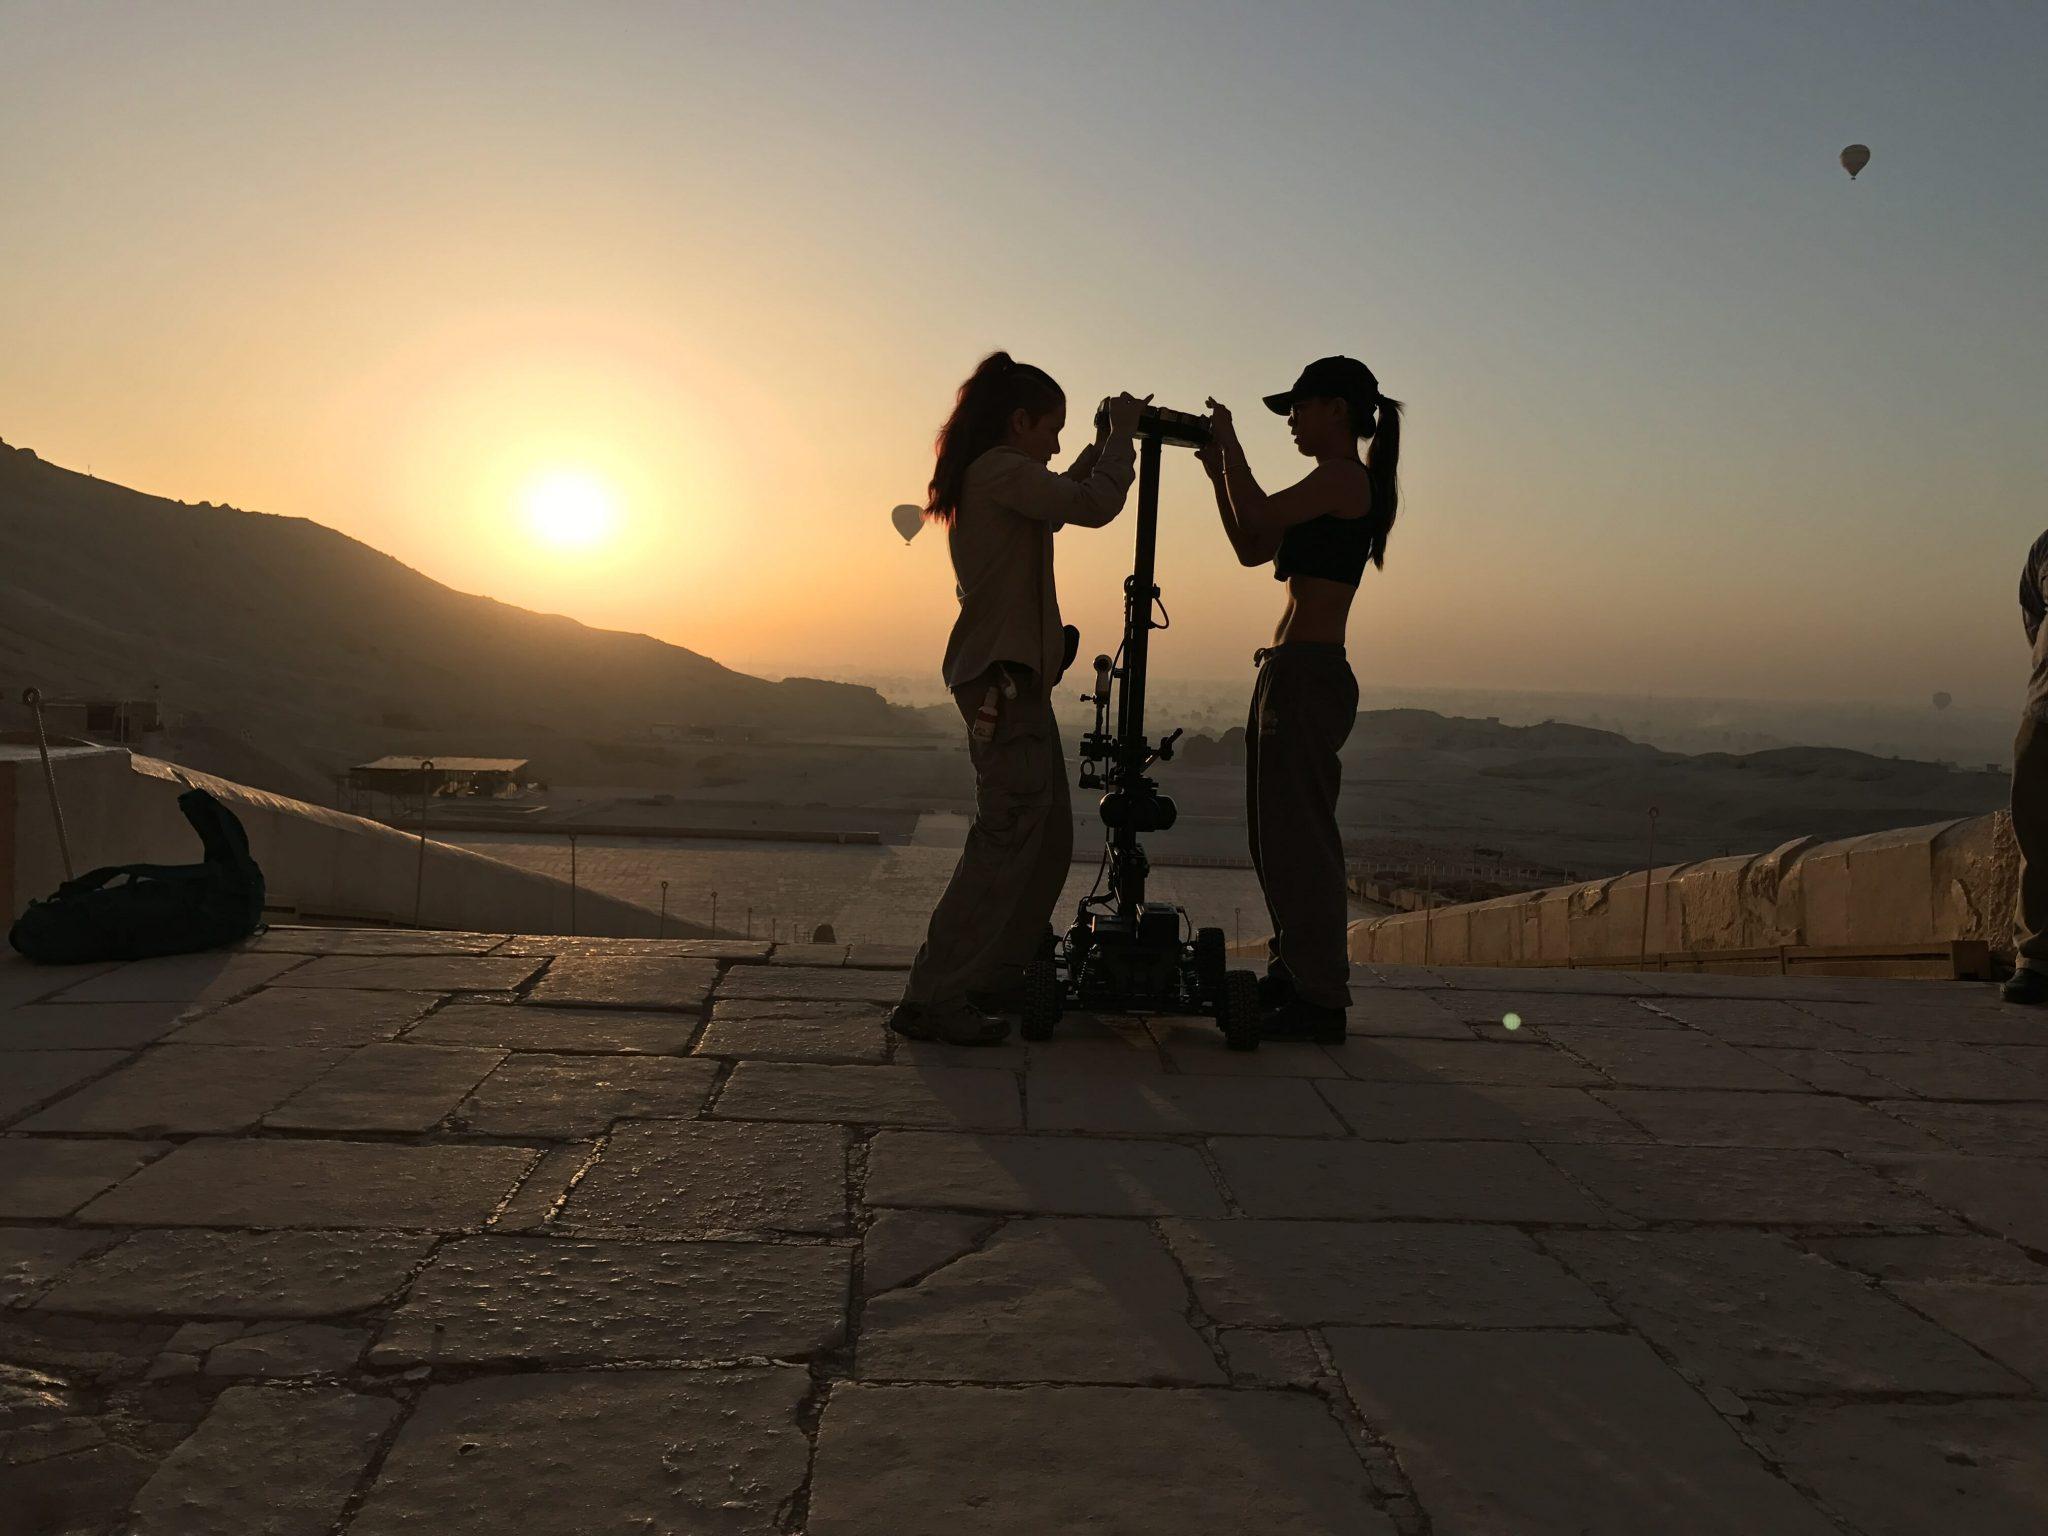 people prepare to shoot at nefertari's tomb virtual reality